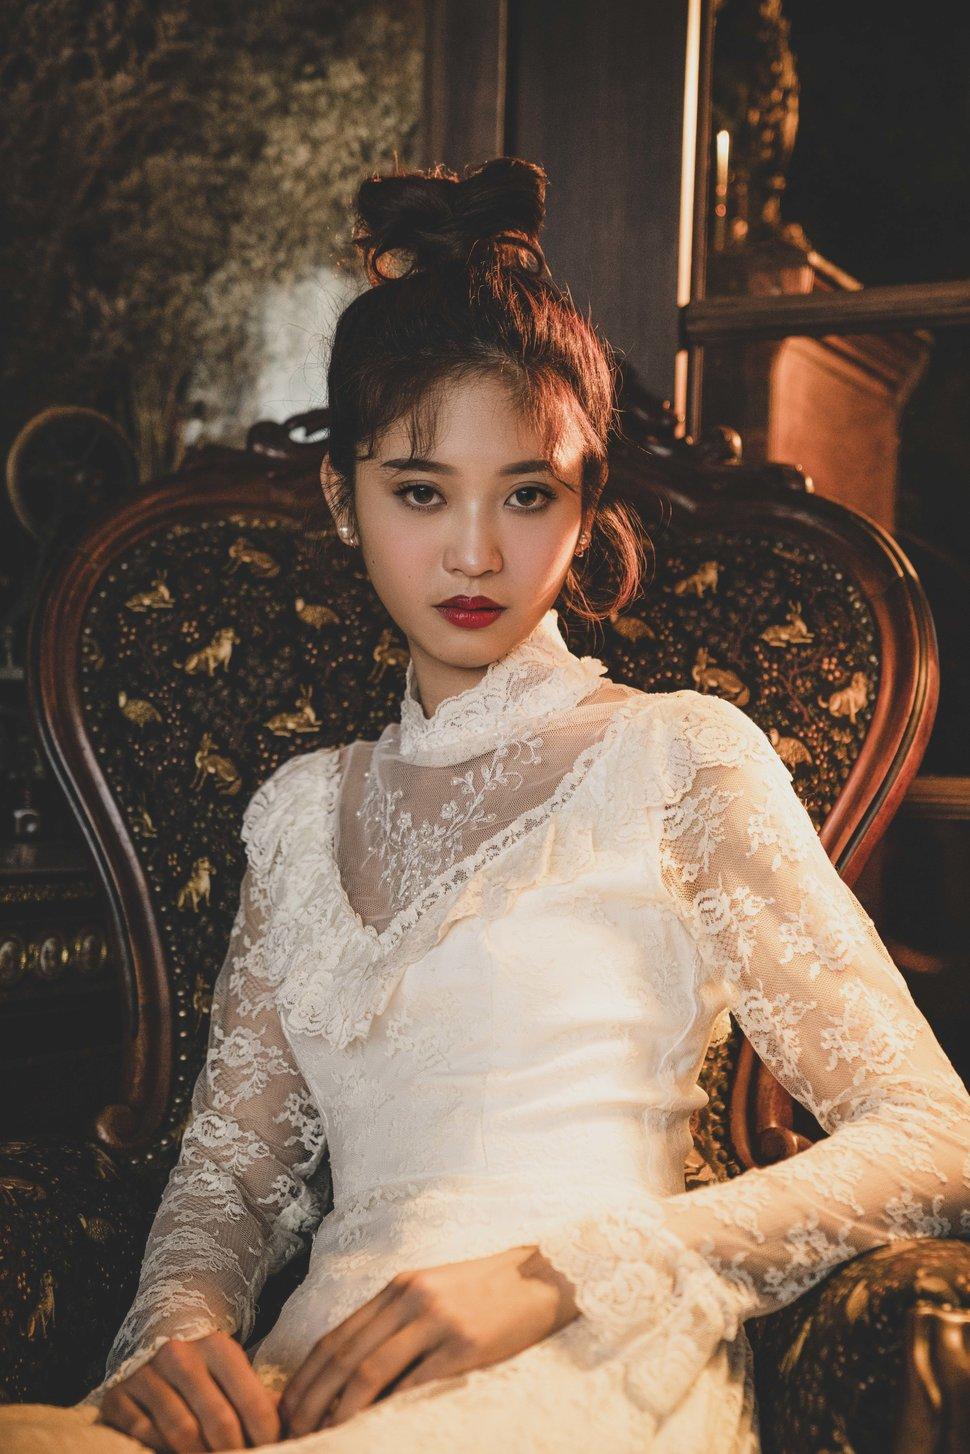 GM_07479 - GM俊彥 uxrw art studio - 結婚吧